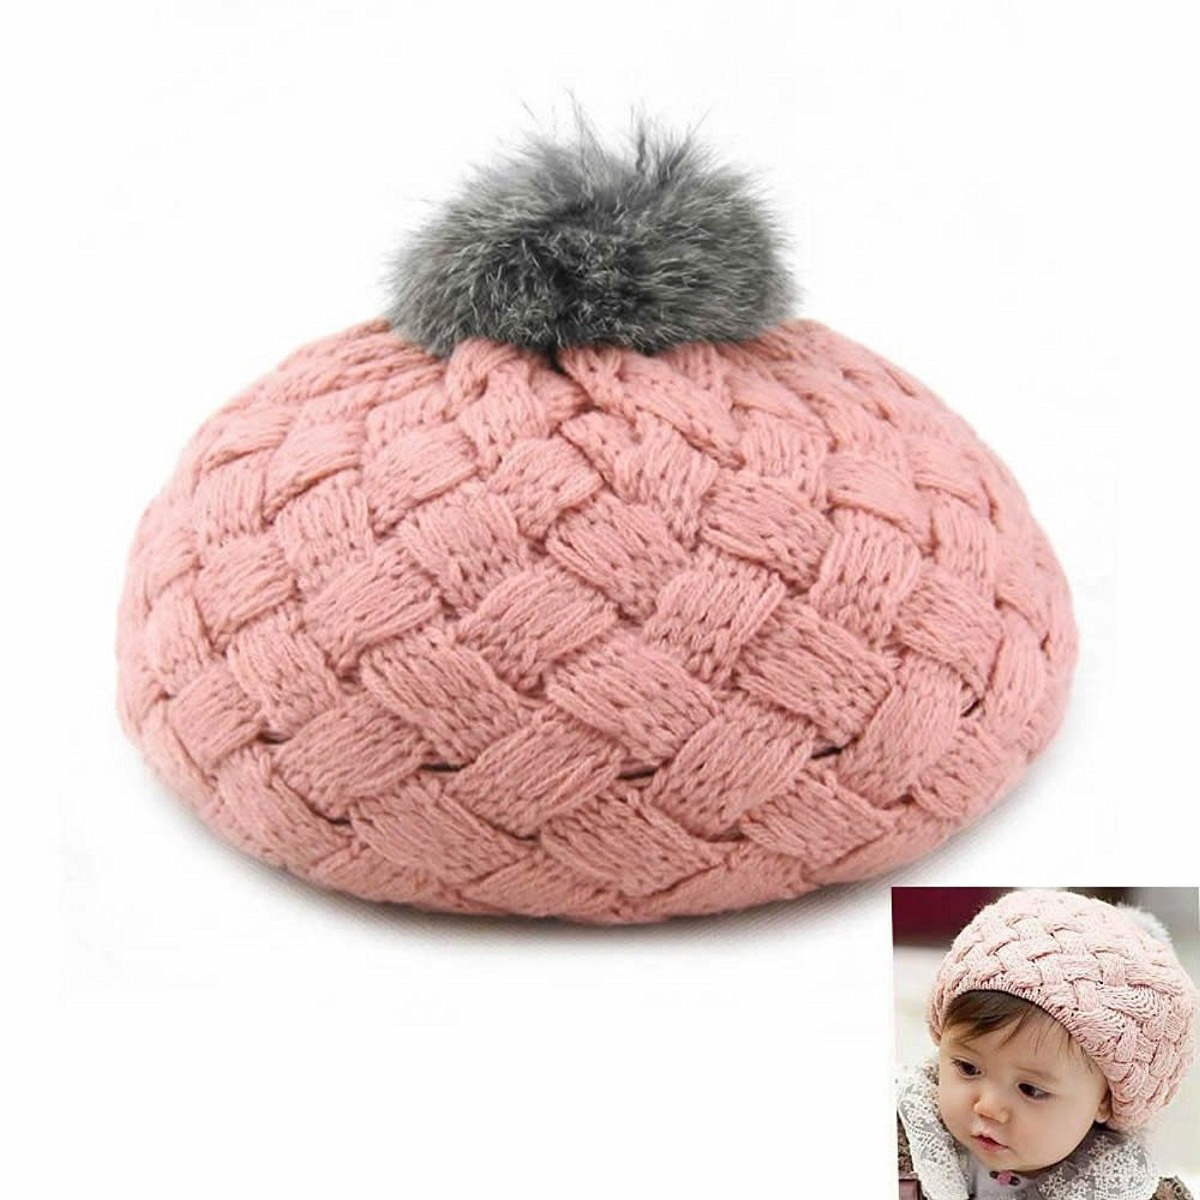 Tapa Sombrero Crochet Capucha Lindo Caliente Niñas Bufanda ... 0c0a0c92ed0